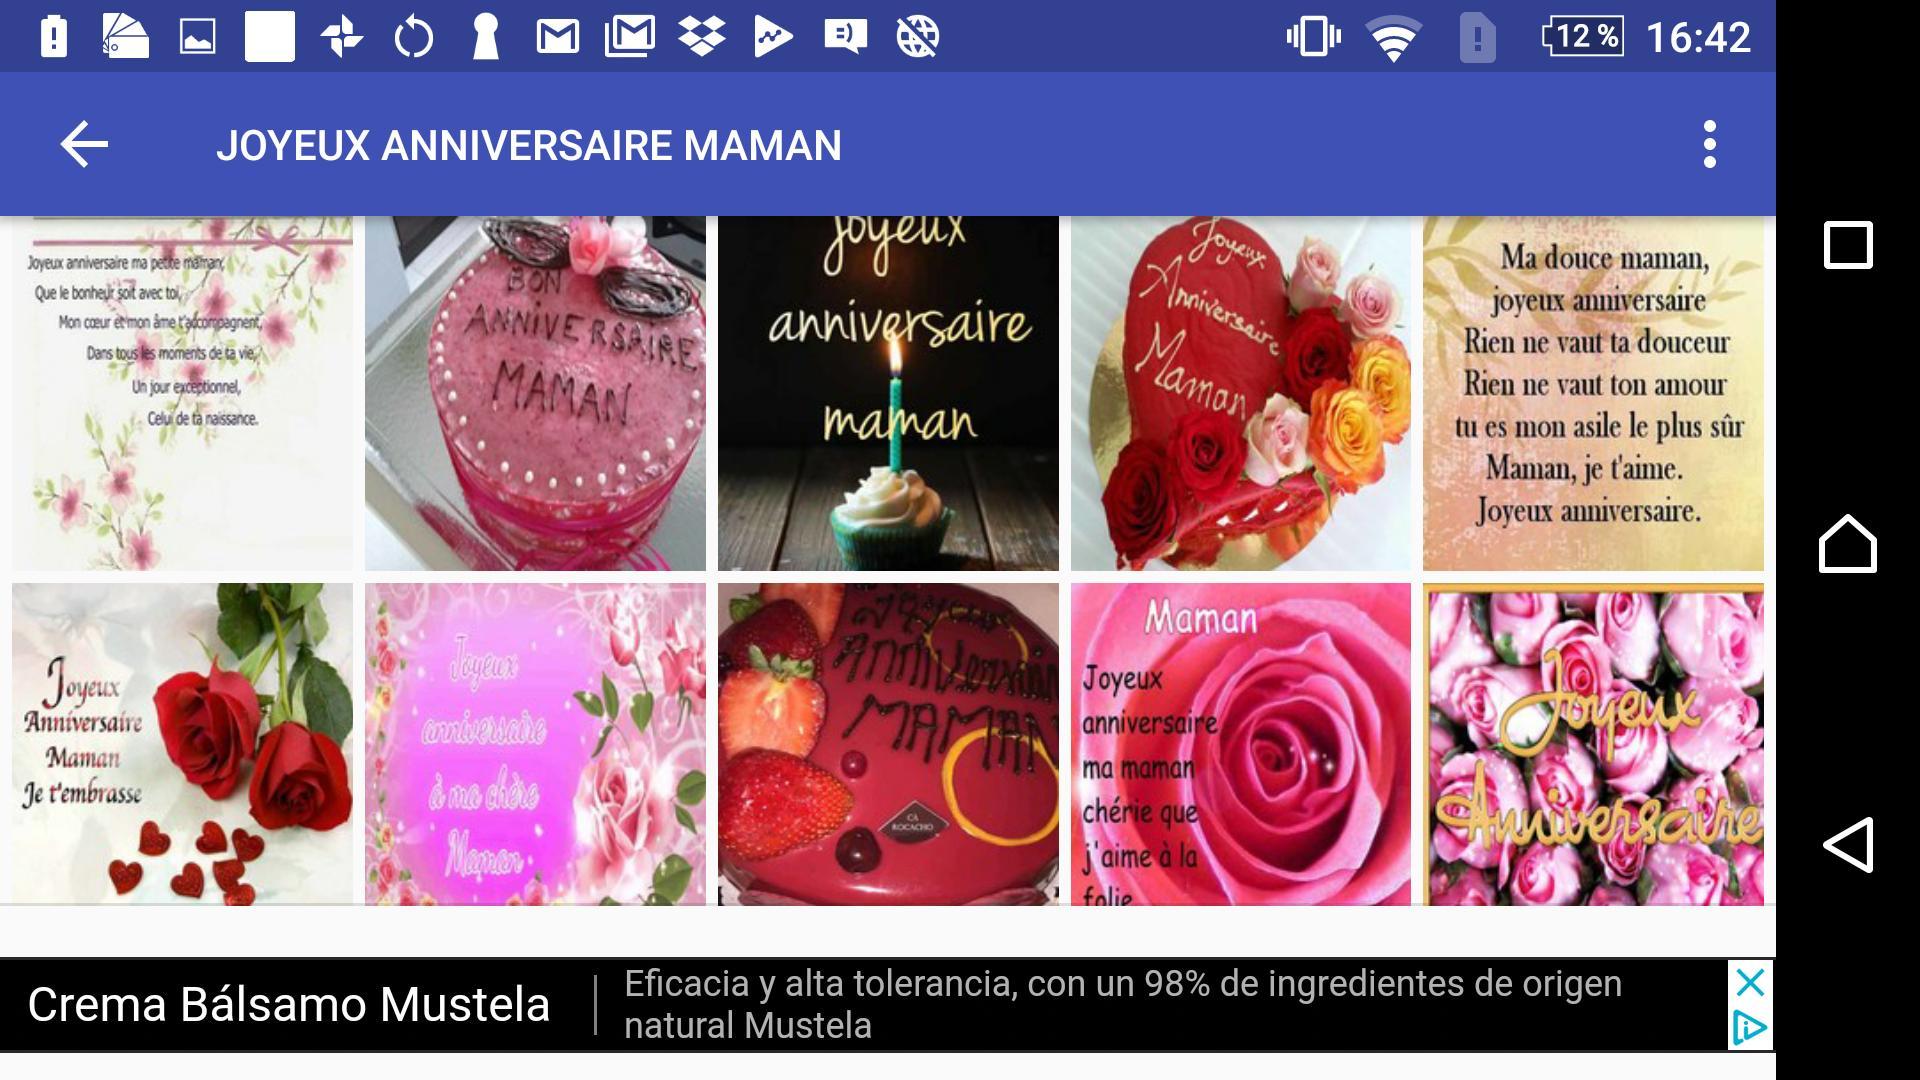 Joyeux Anniversaire Maman For Android Apk Download